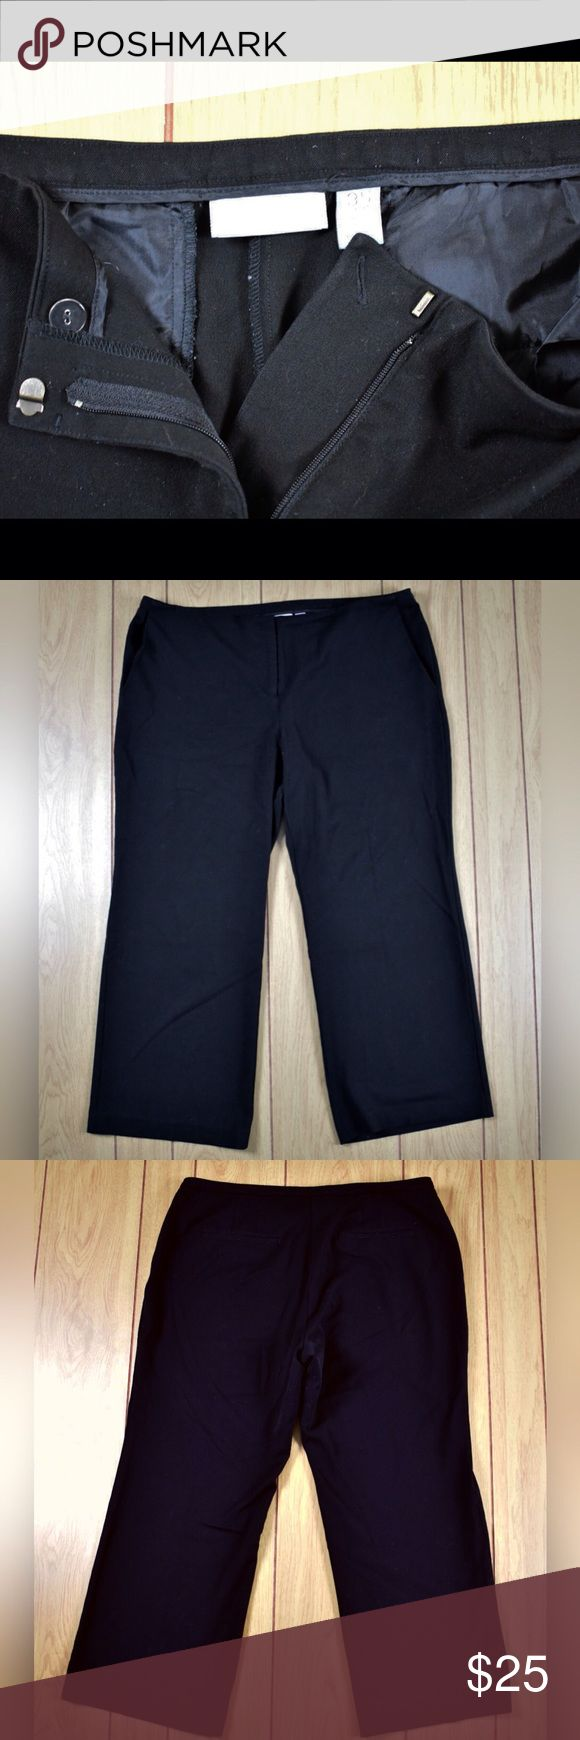 CHICO'S Plus Size 3.5 short Black Dress pants Chico's ladies plus size 3.5 Short black dress pants 70% polyester 27% rayon 3% spandex  Measurement (approximate- flat garment) waist 40 inseam 29 rise front 11.5 back 14 leg opening 11 ___ Chico's Pants Trousers